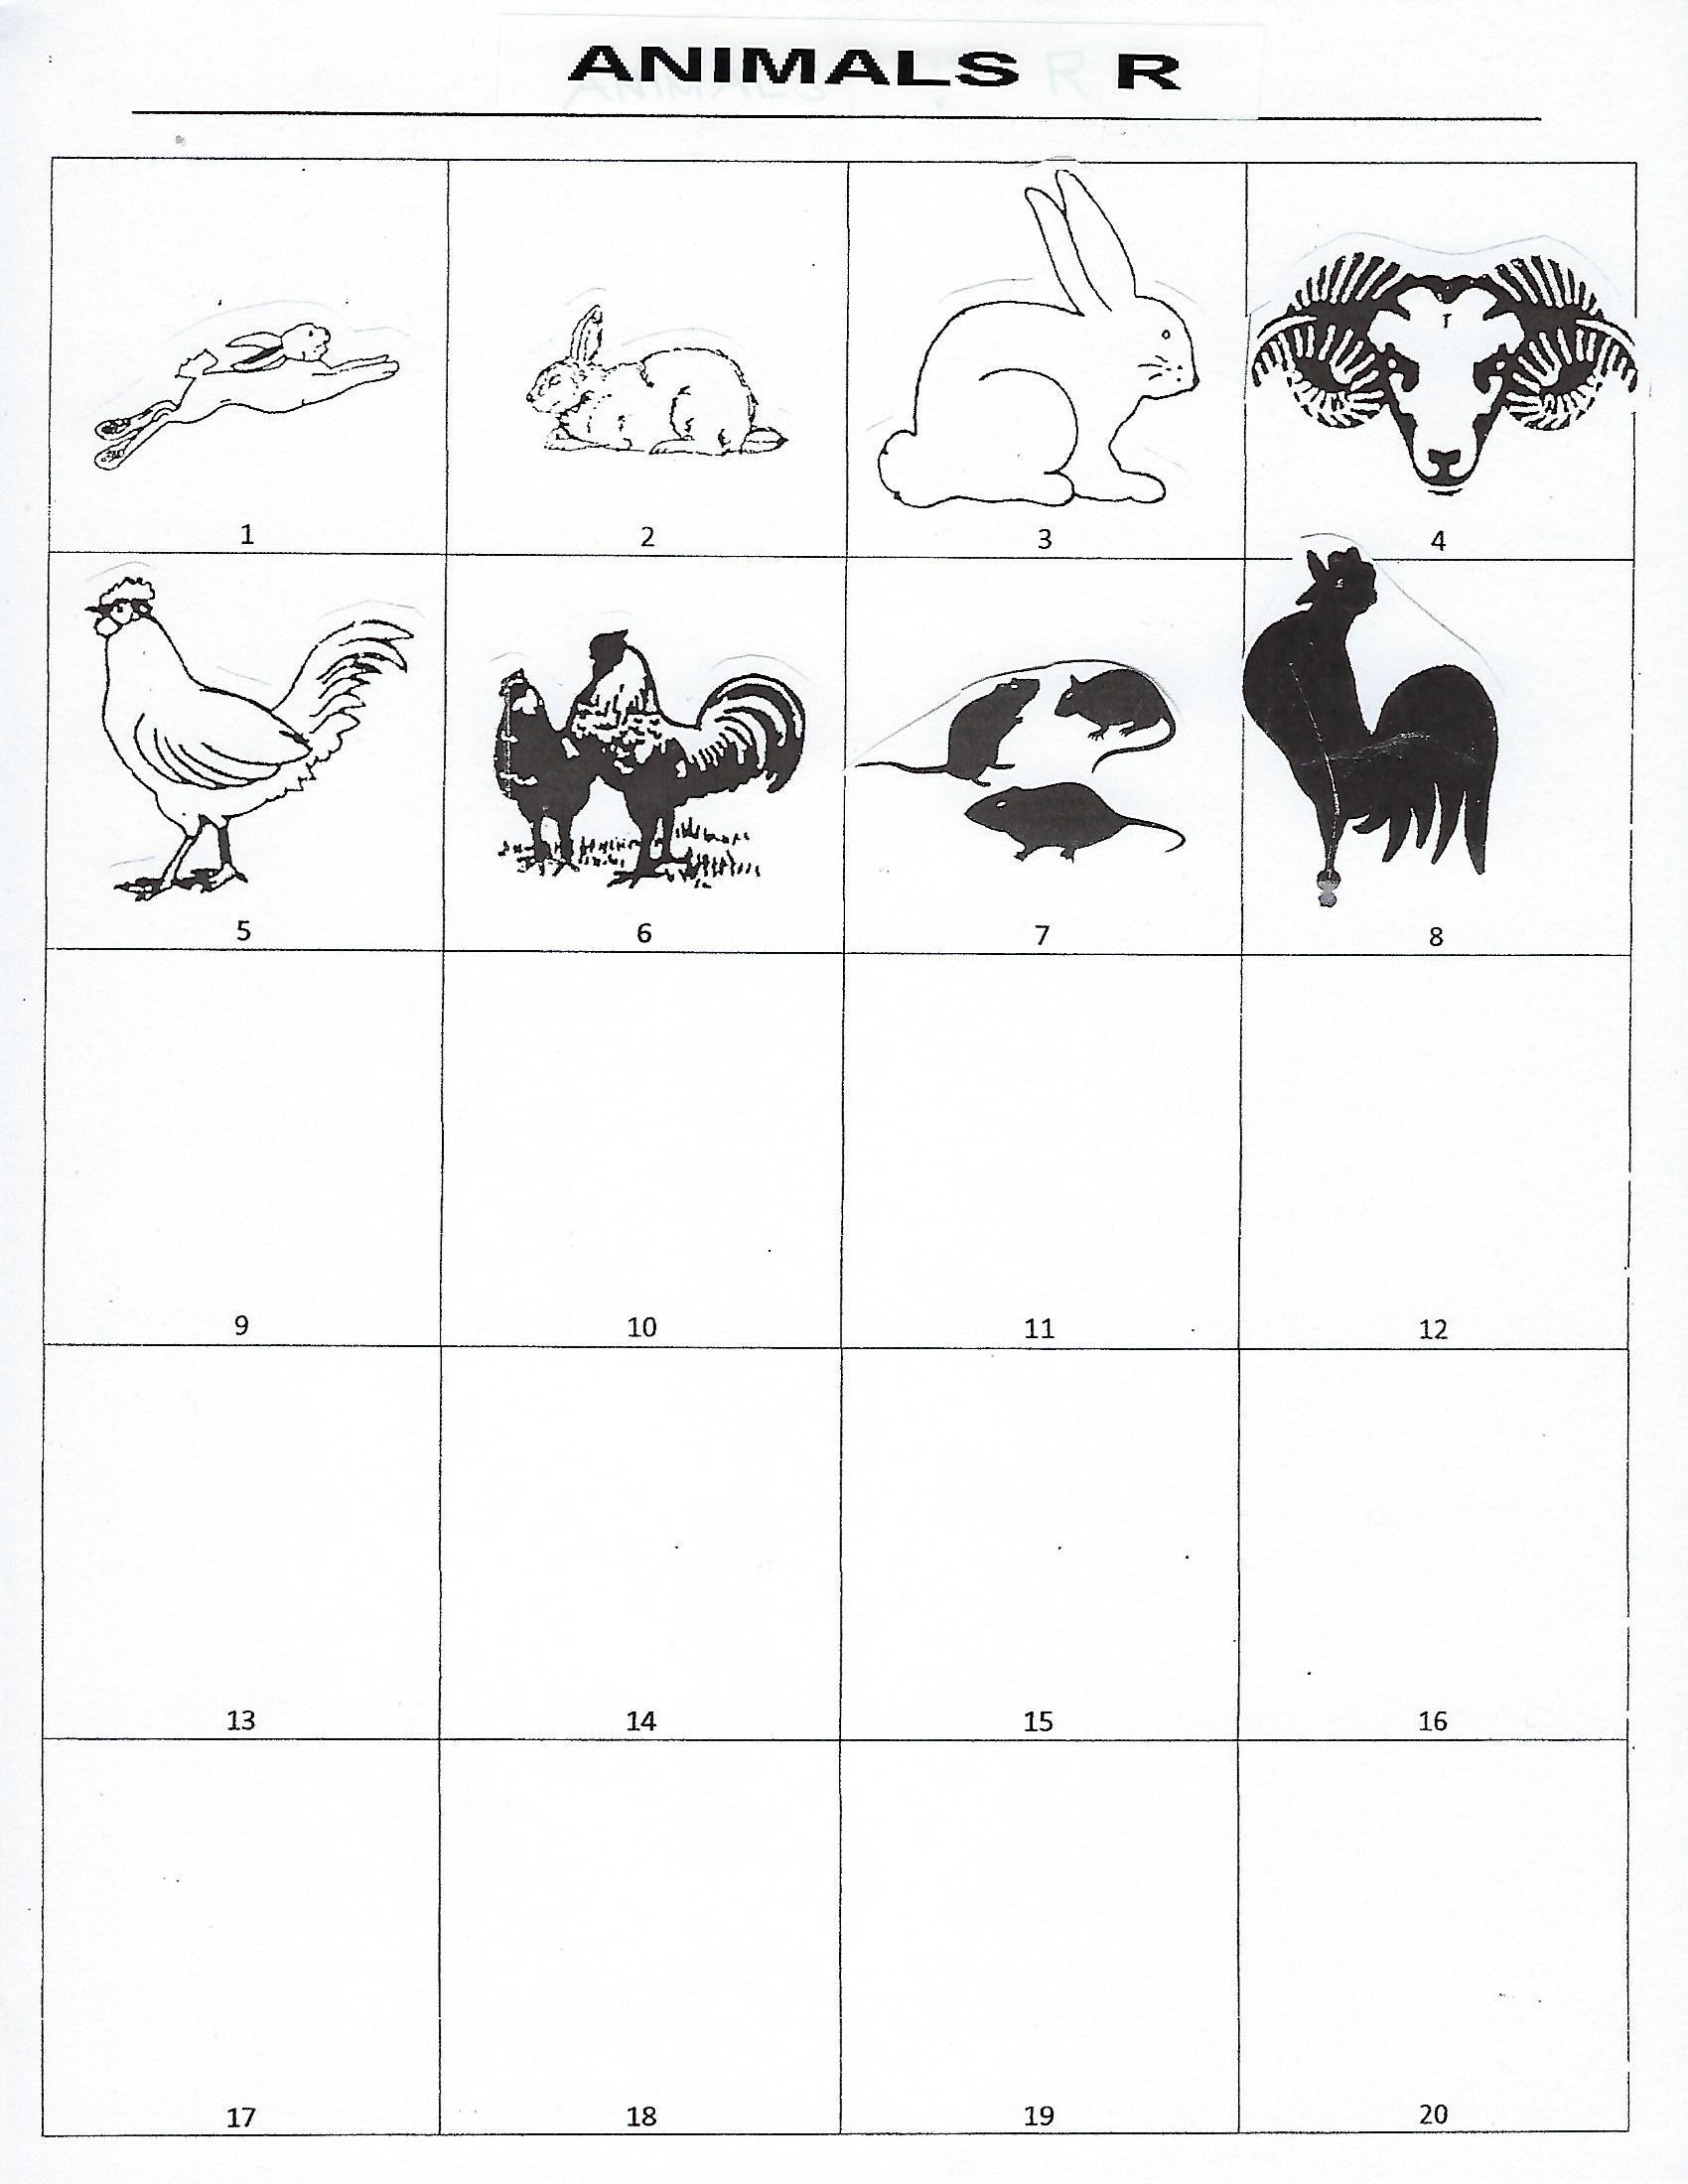 Animals R